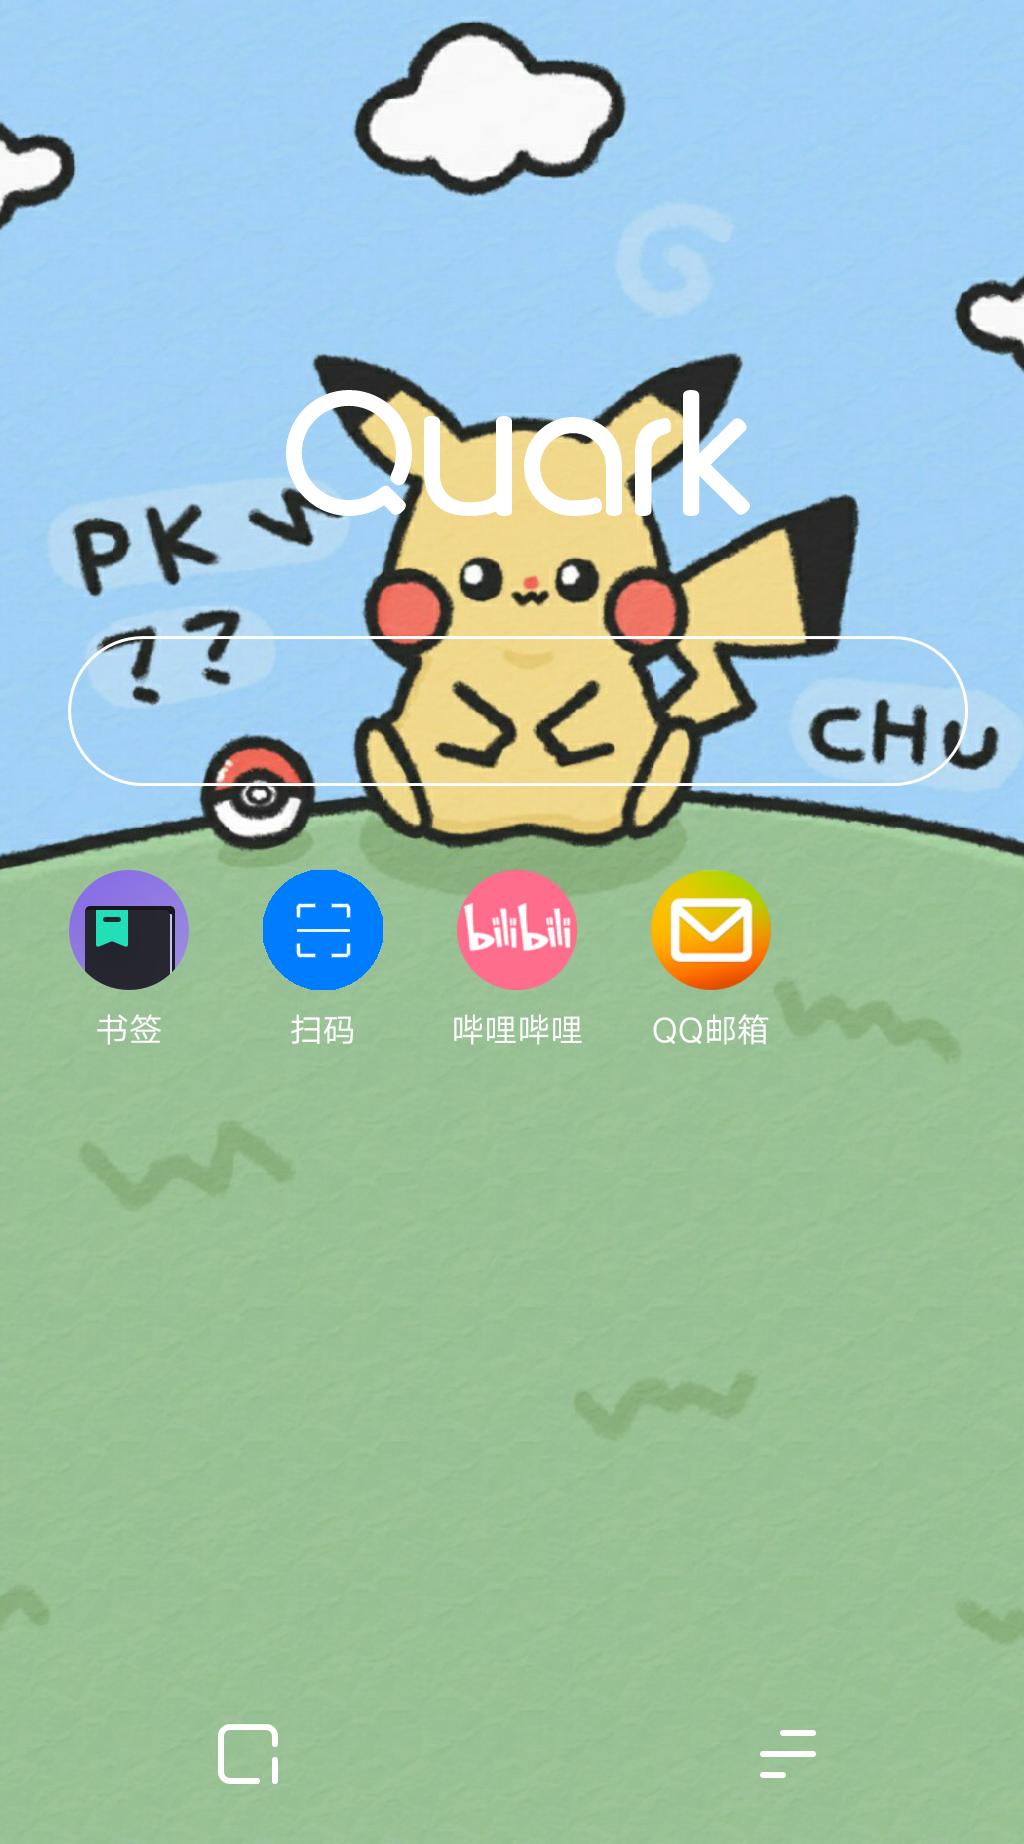 Android]夸克浏览器精简不弹更新修改版